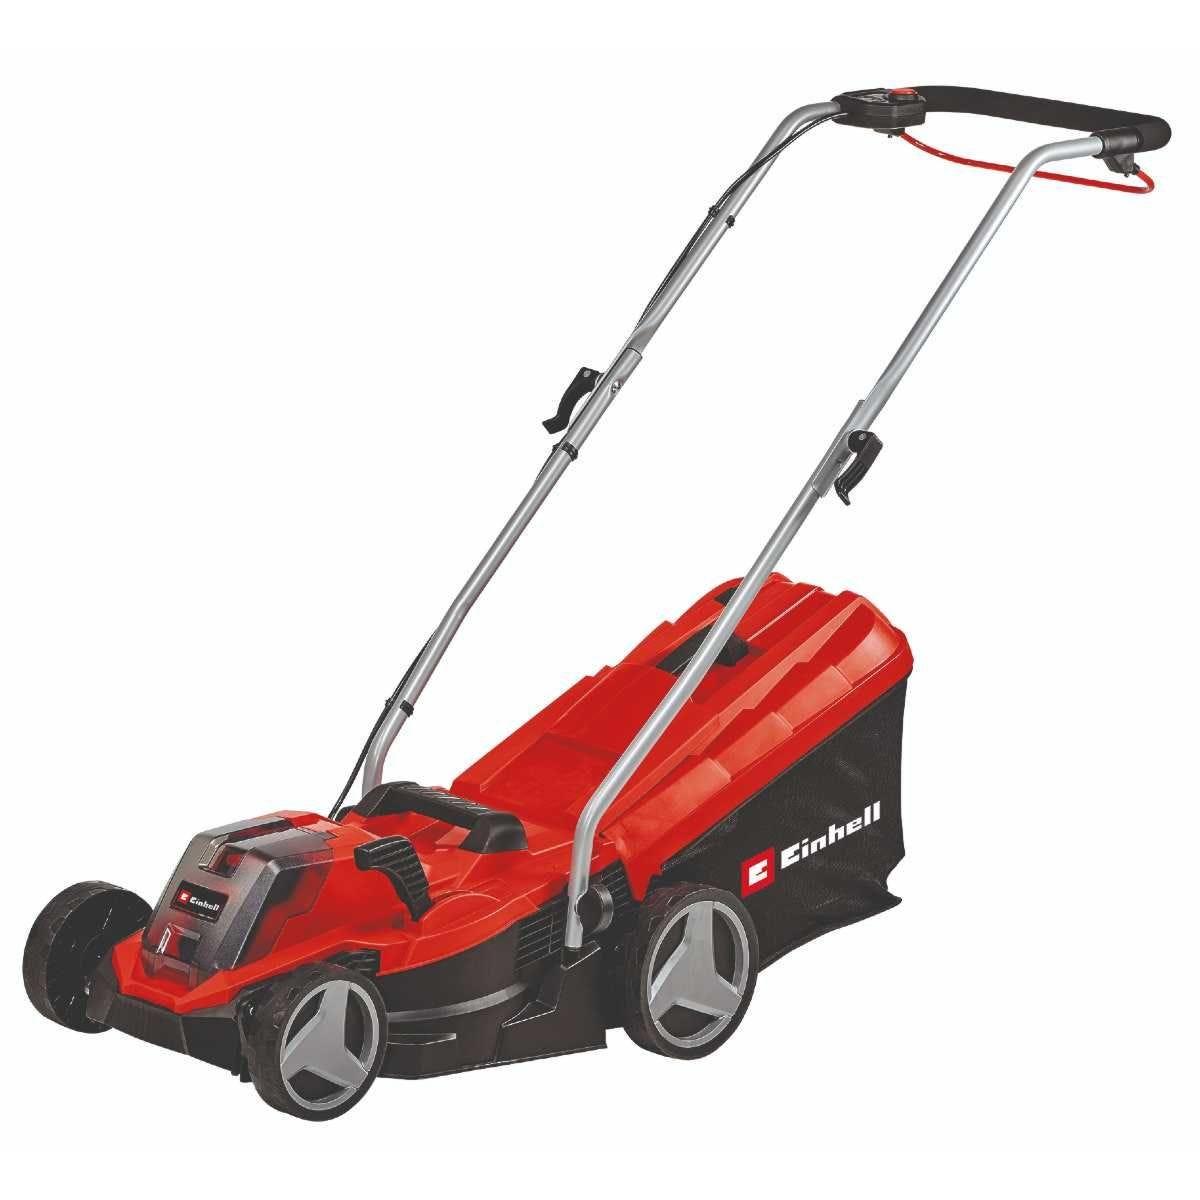 Einhell 18v Cordless 33cm Lawn Mower